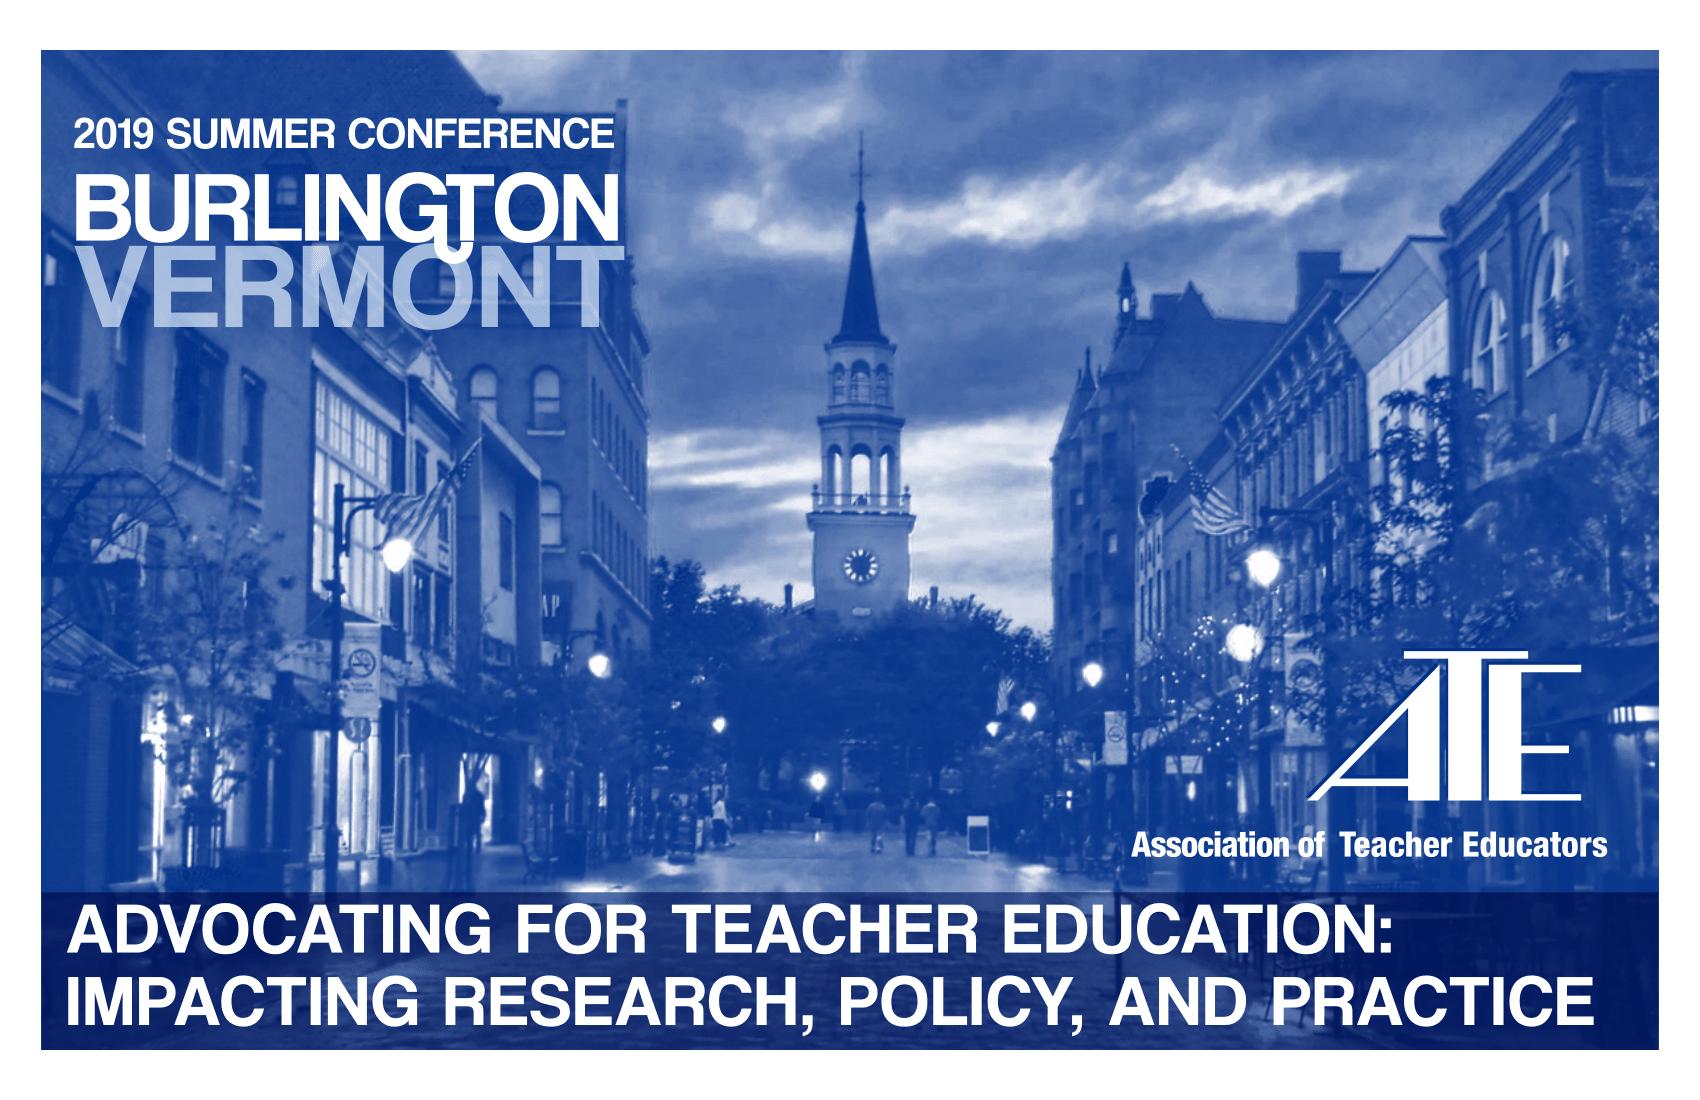 Association of Teacher Educators - Exhibit at ATE's Annual Meeting